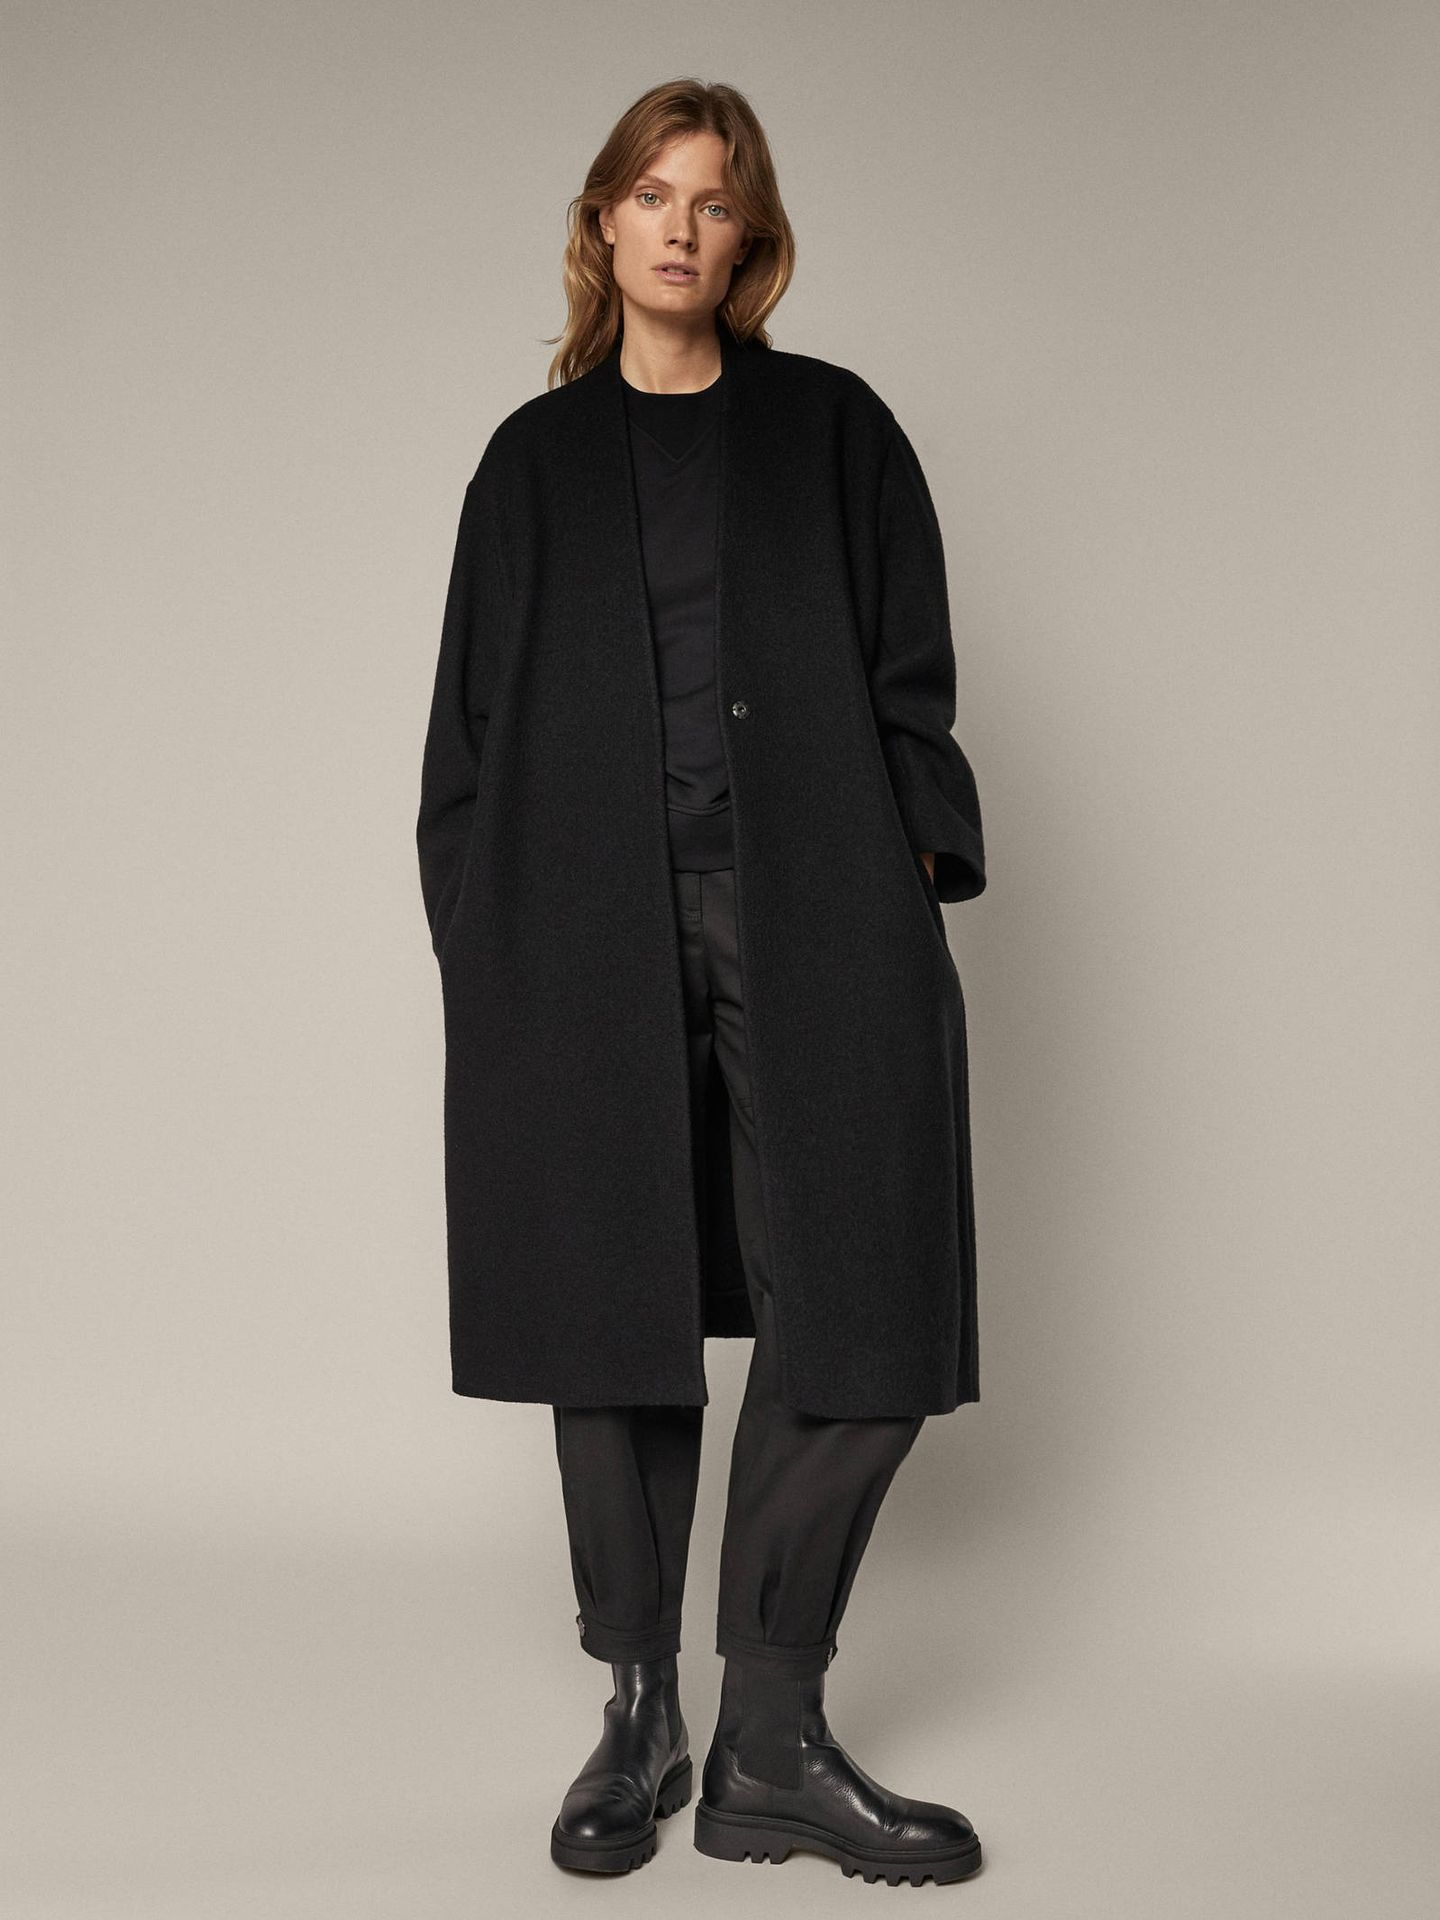 Este abrigo de Massimo Dutti es ideal para cualquier ocasión. (Cortesía)